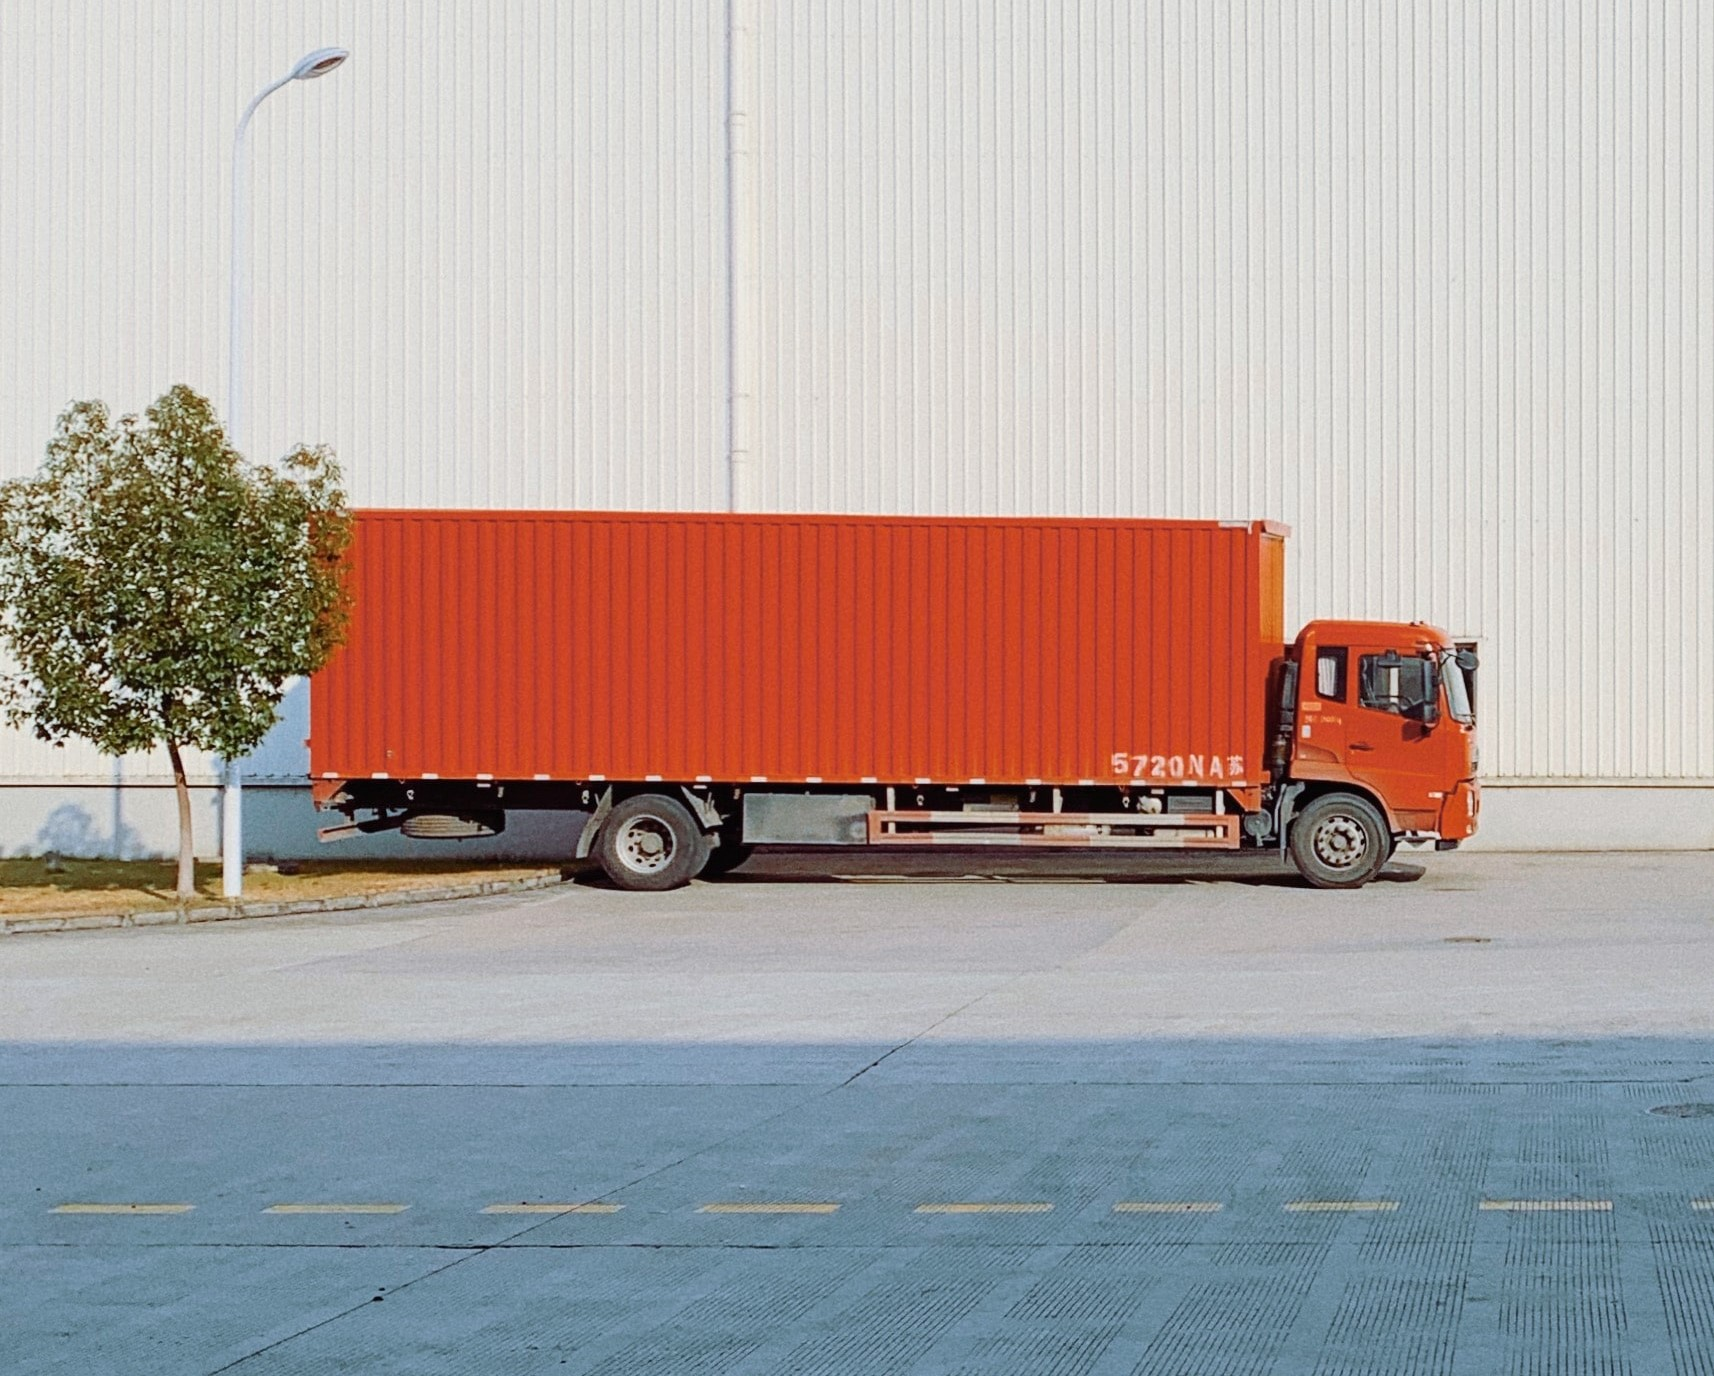 Camion commercial stationné